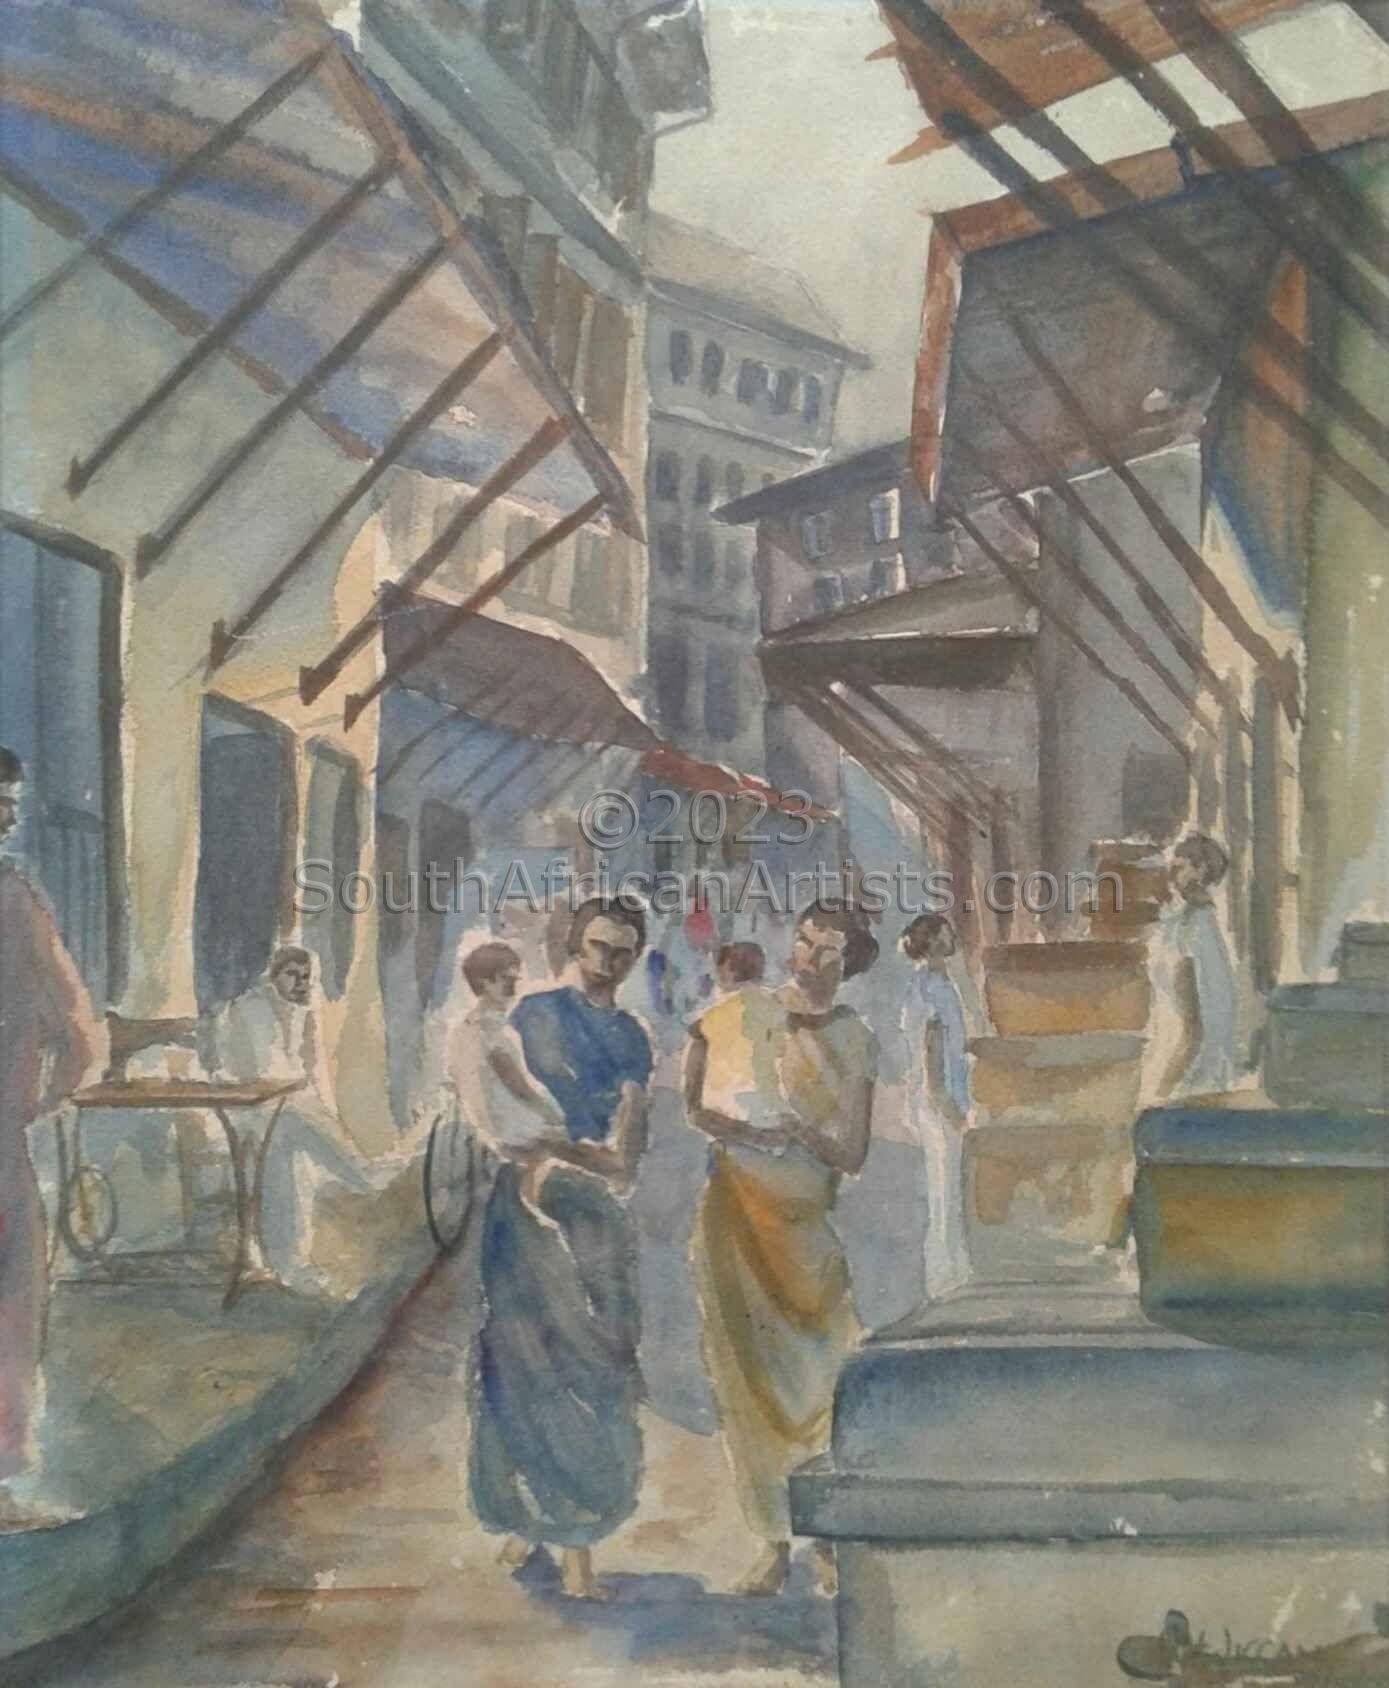 Zanzibar - busy street